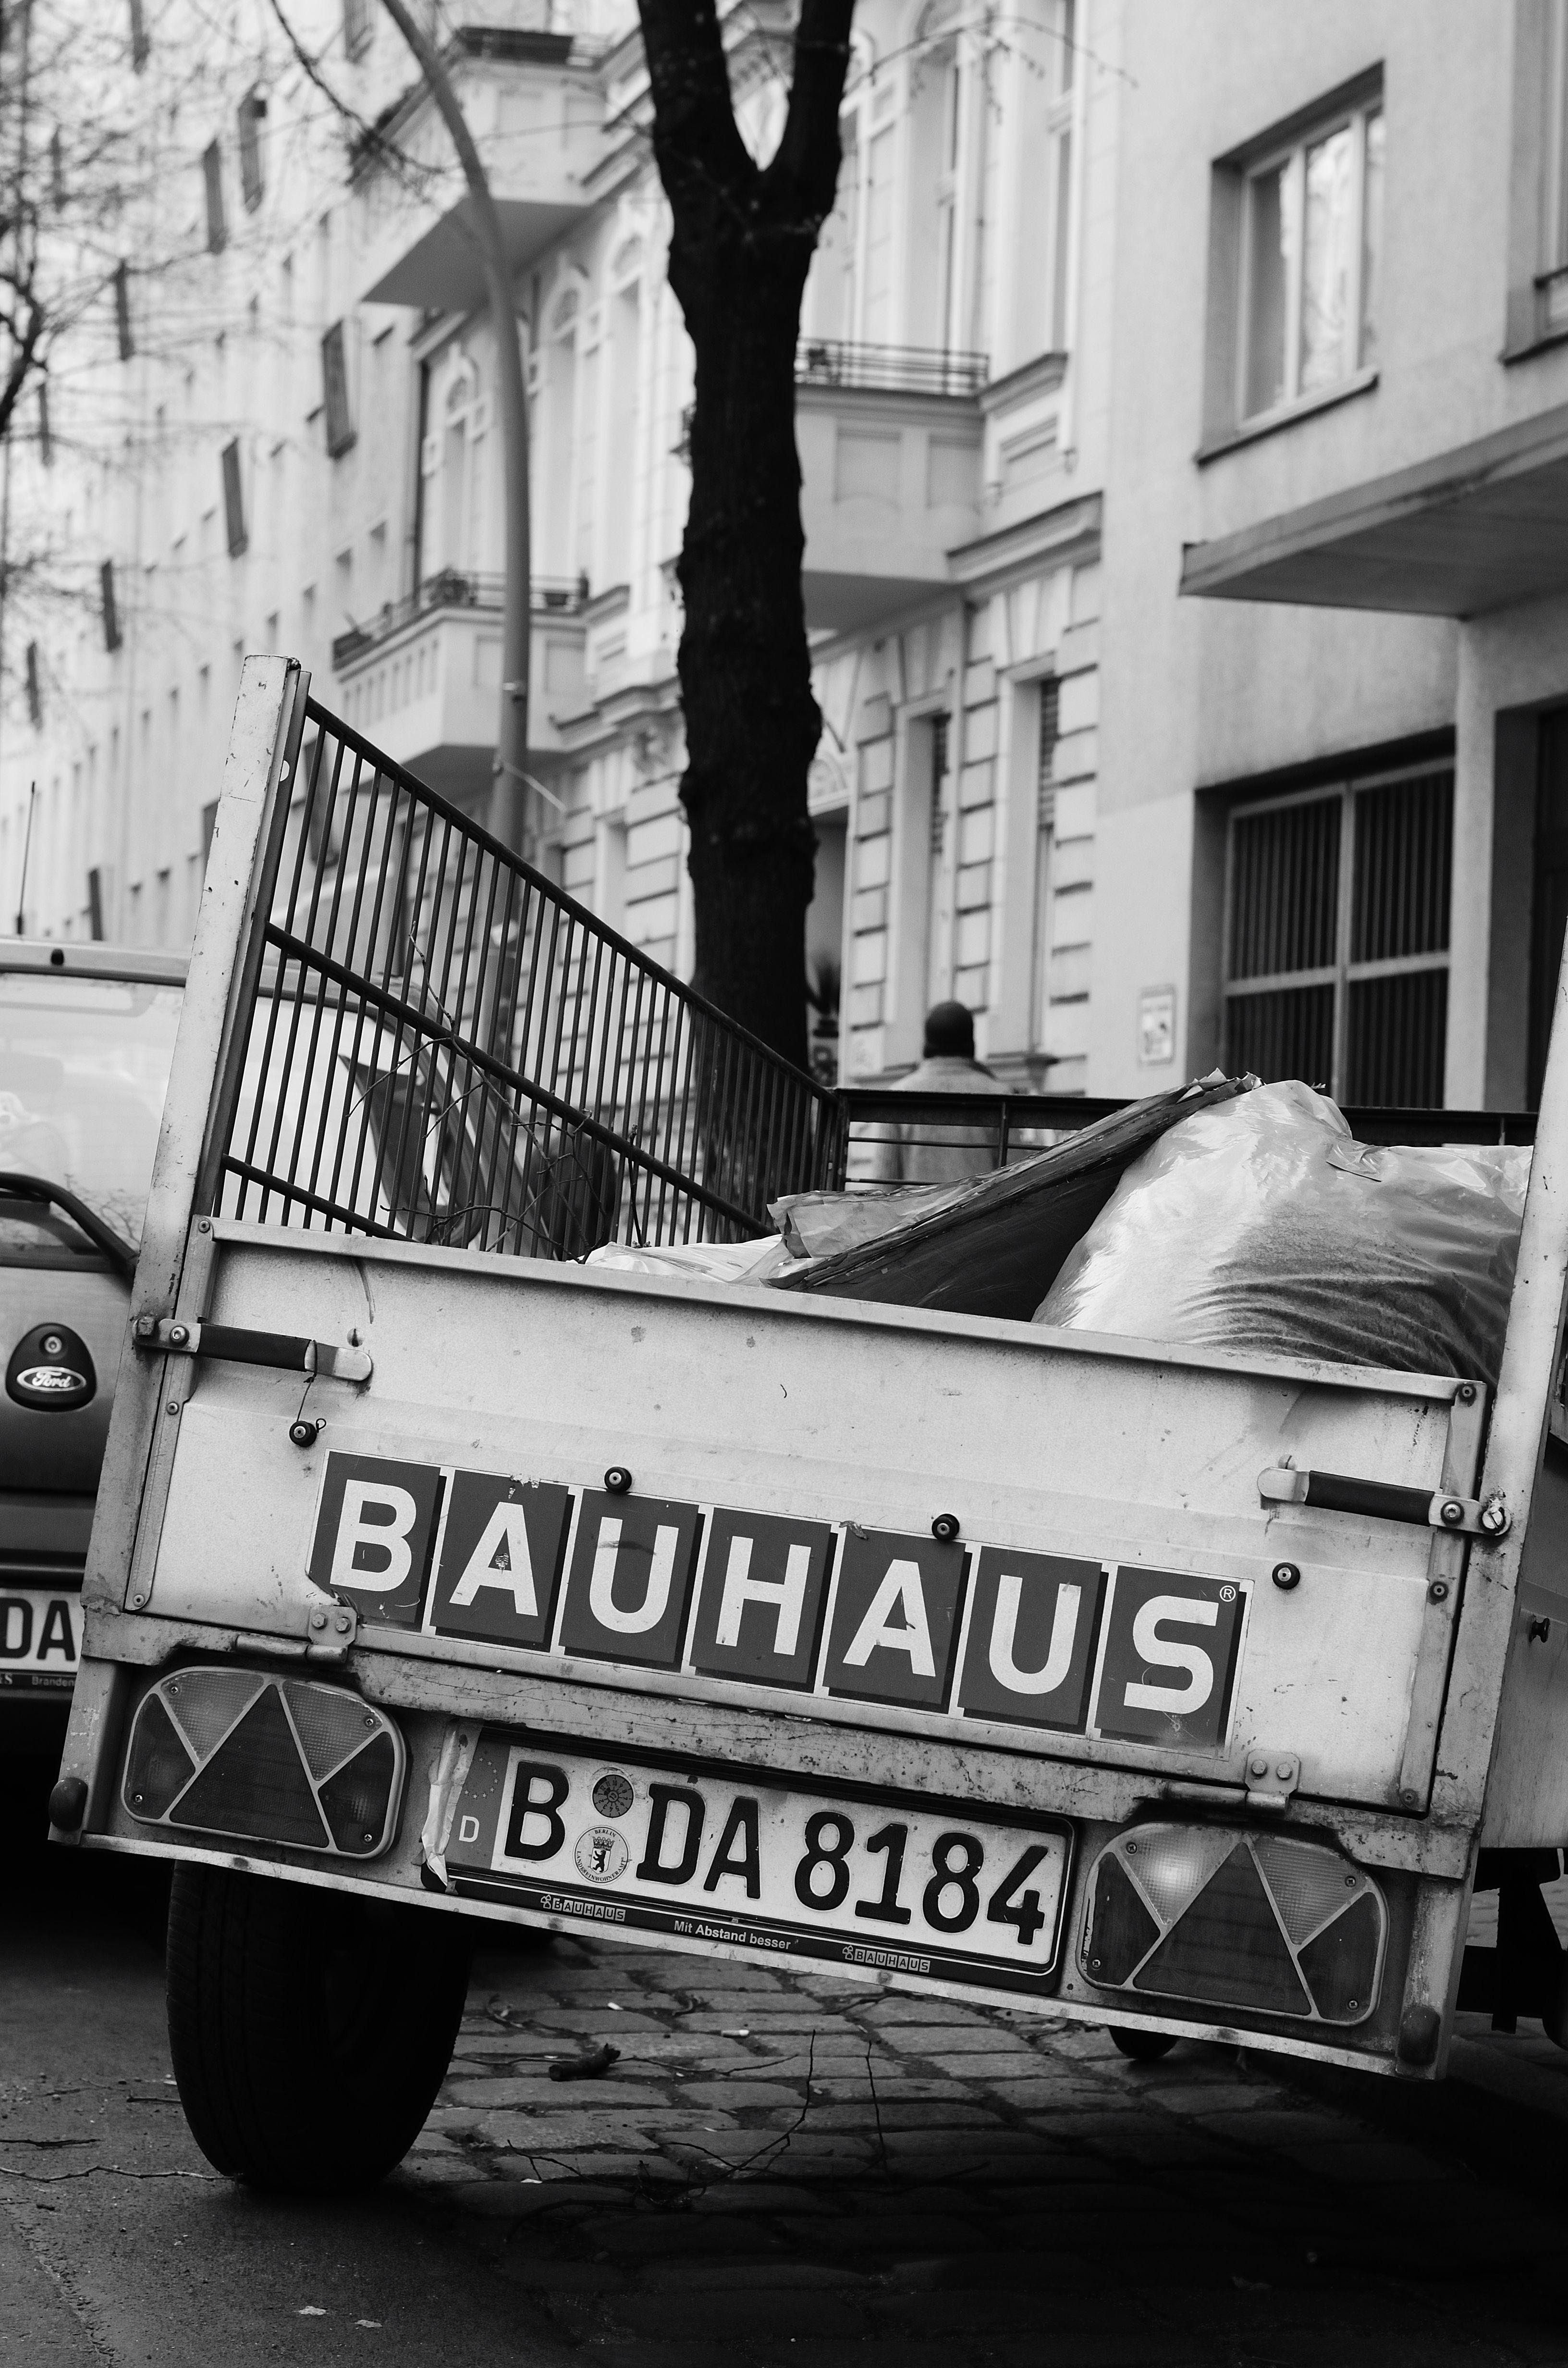 Bauhaus Pankow berlin bauhaus is like lowes or home depot 51 00 9 00